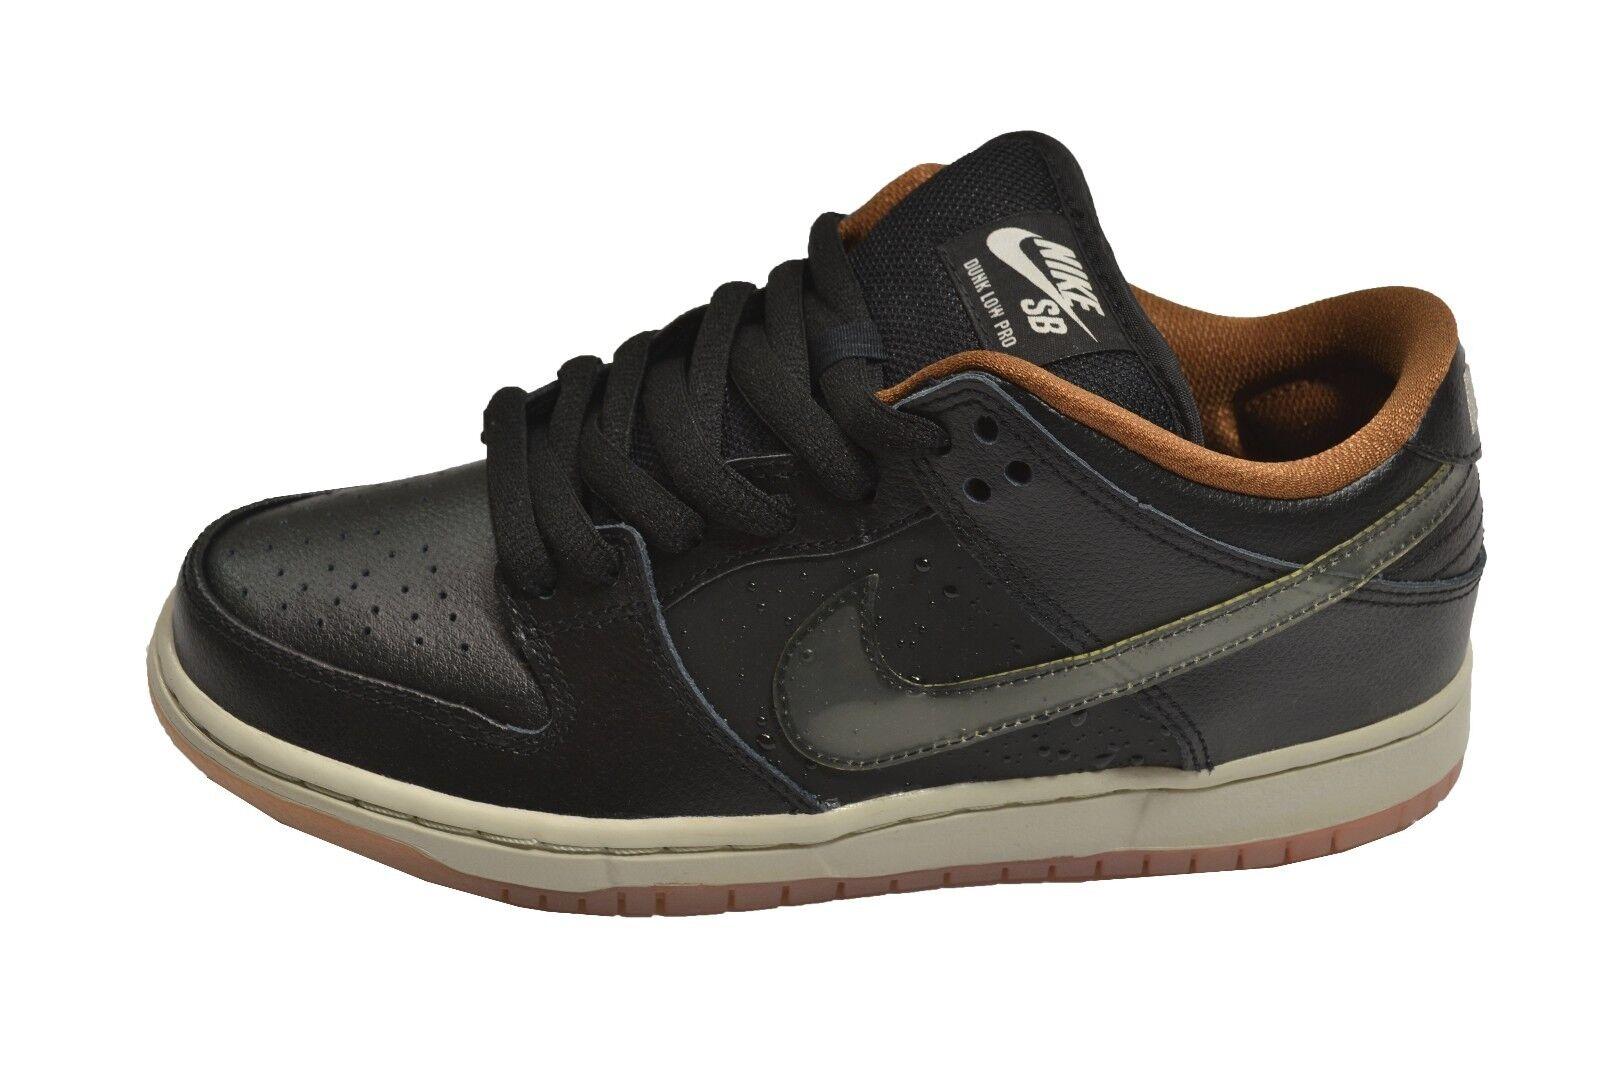 Nike DUNK LOW PREMIUM SB QS negro Light Clear Light negro Bone Discounted (313) Hombre Zapatos 6ad94b